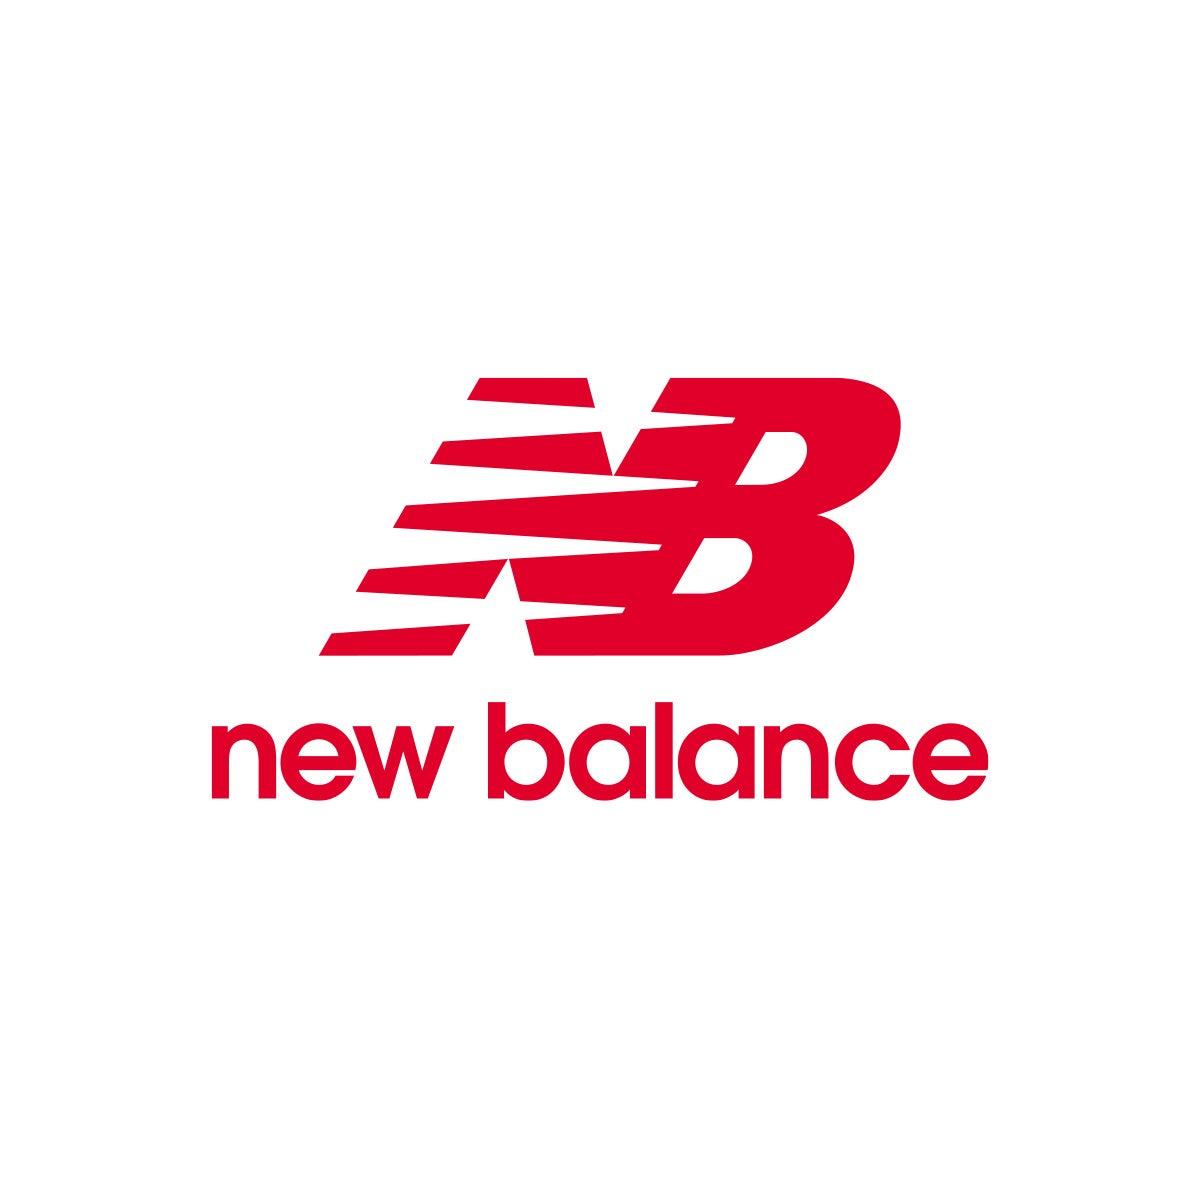 Nb公式 ニューバランス お客様相談室 ご案内 New Balance 公式通販